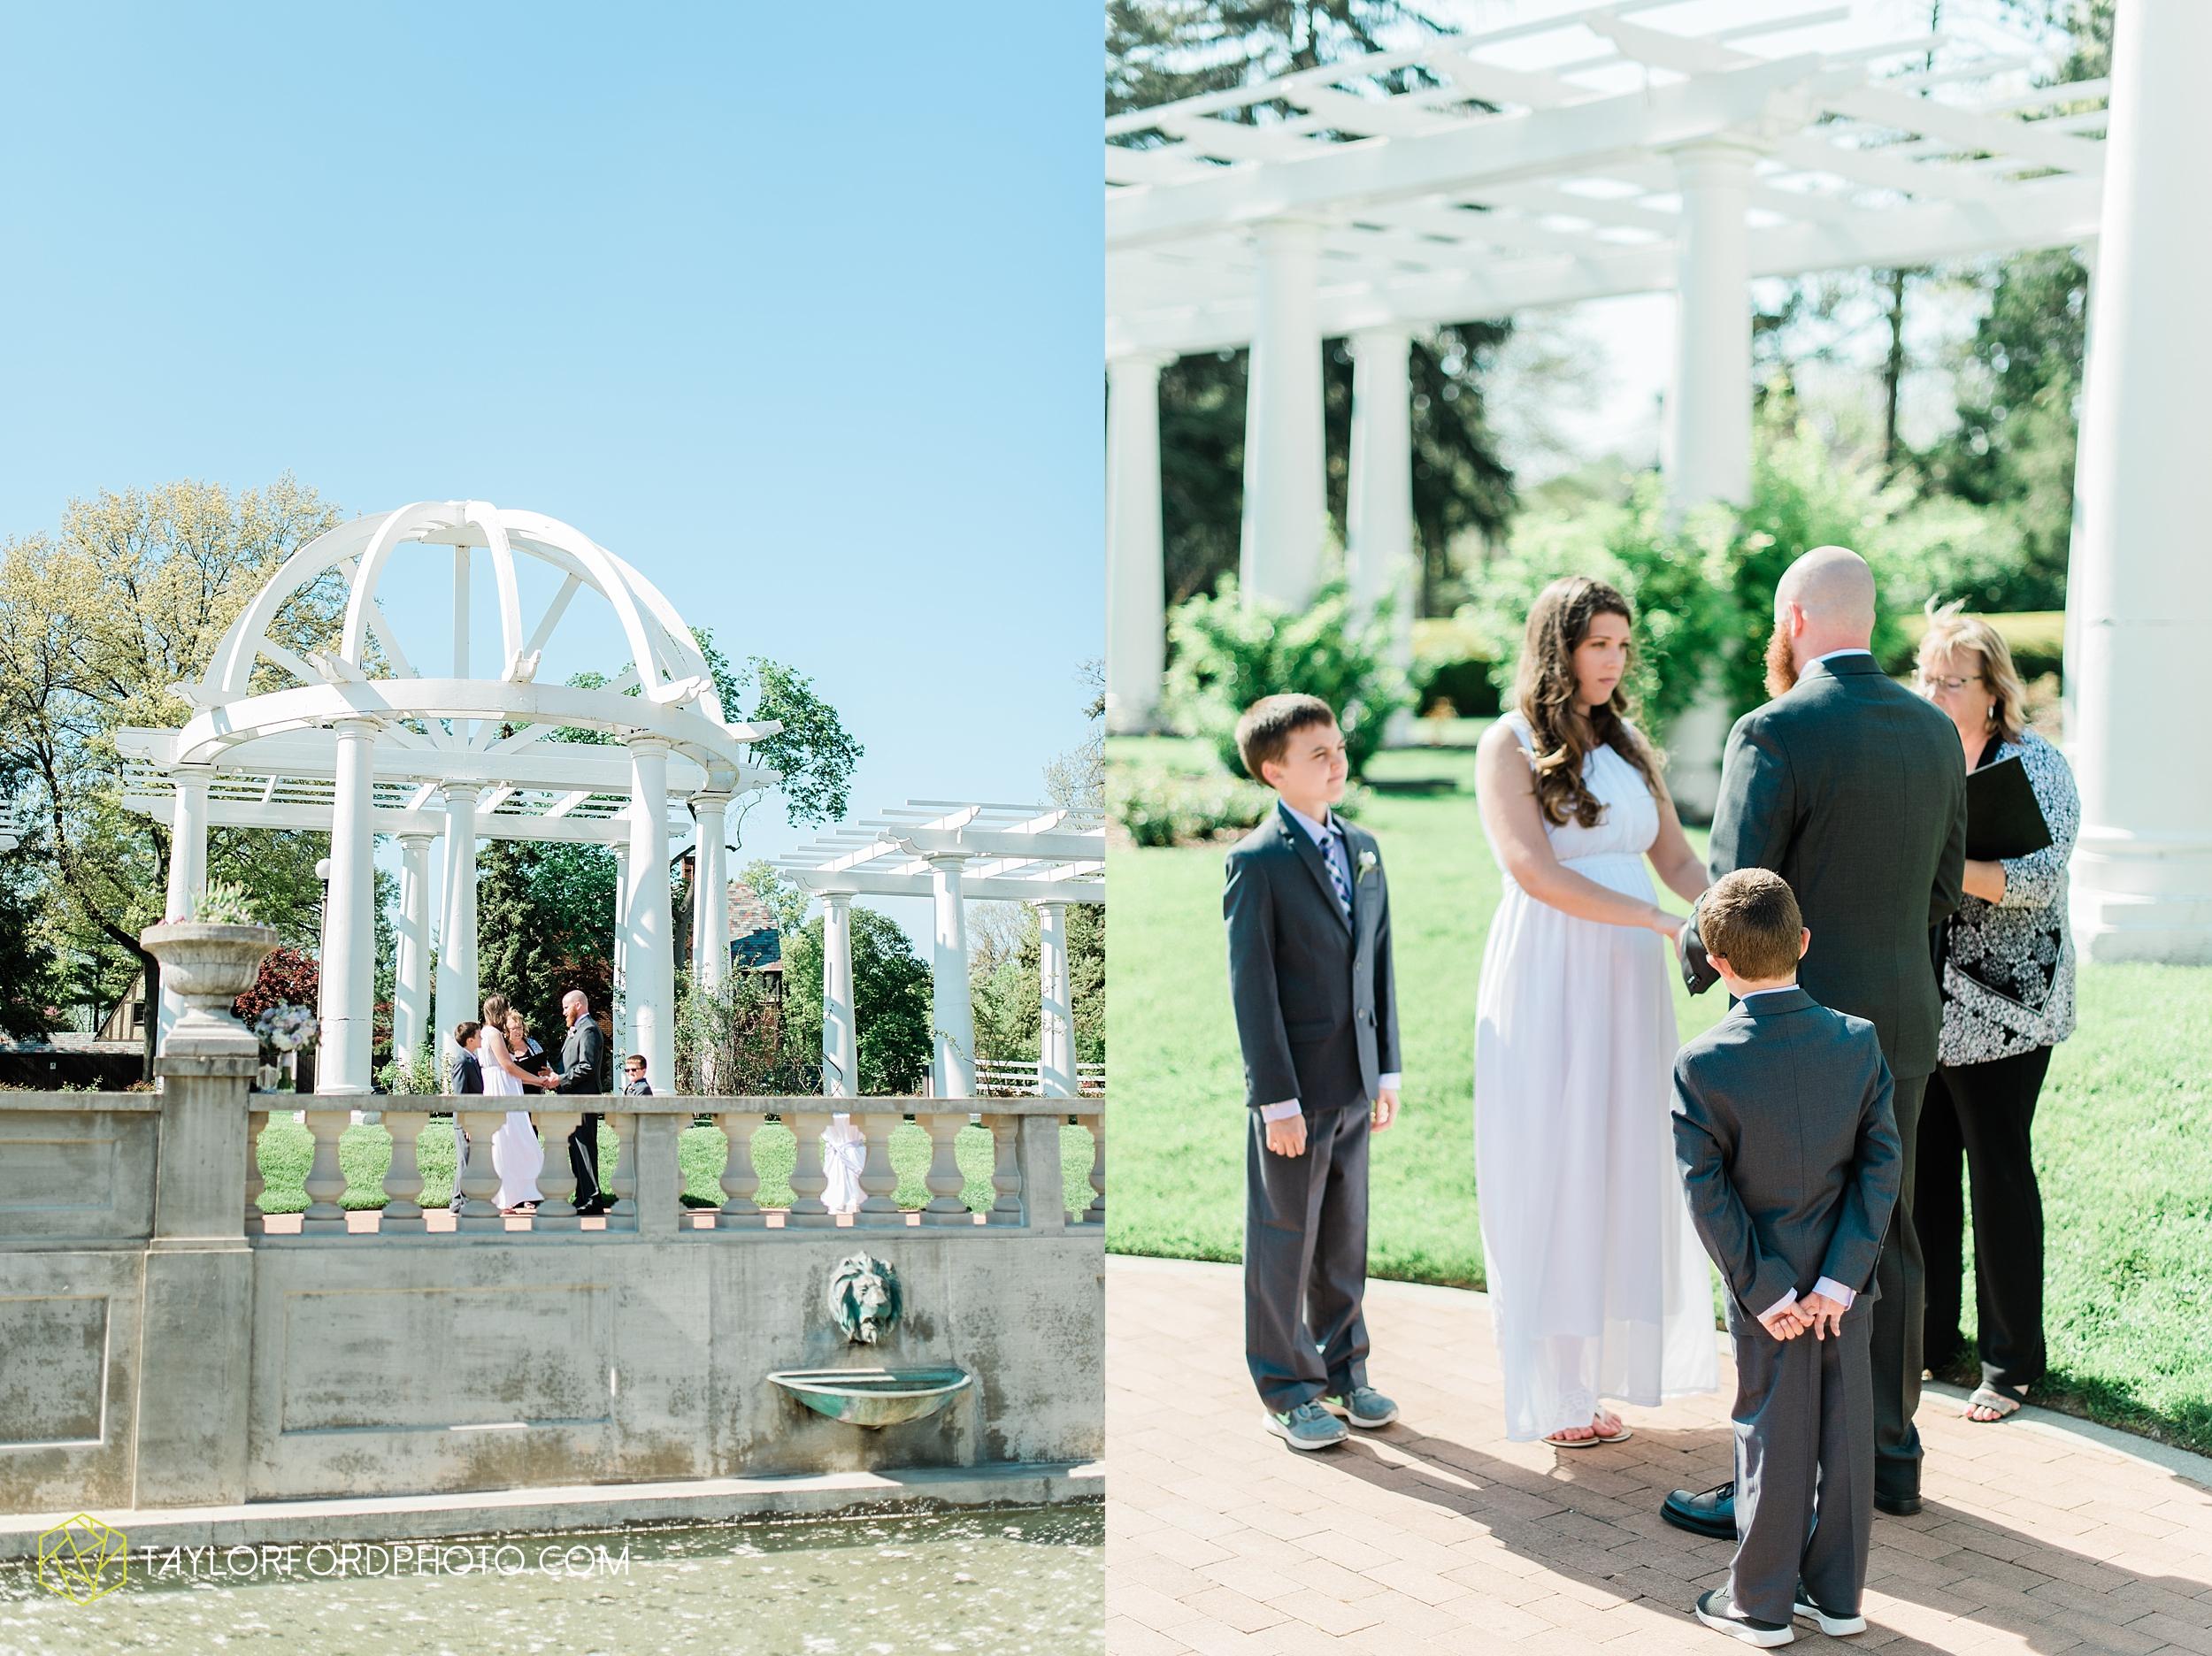 lakeside-rose-gardens-fort-wayne-indiana-elopement-wedding-photographer-Taylor-Ford-Photography_7142.jpg